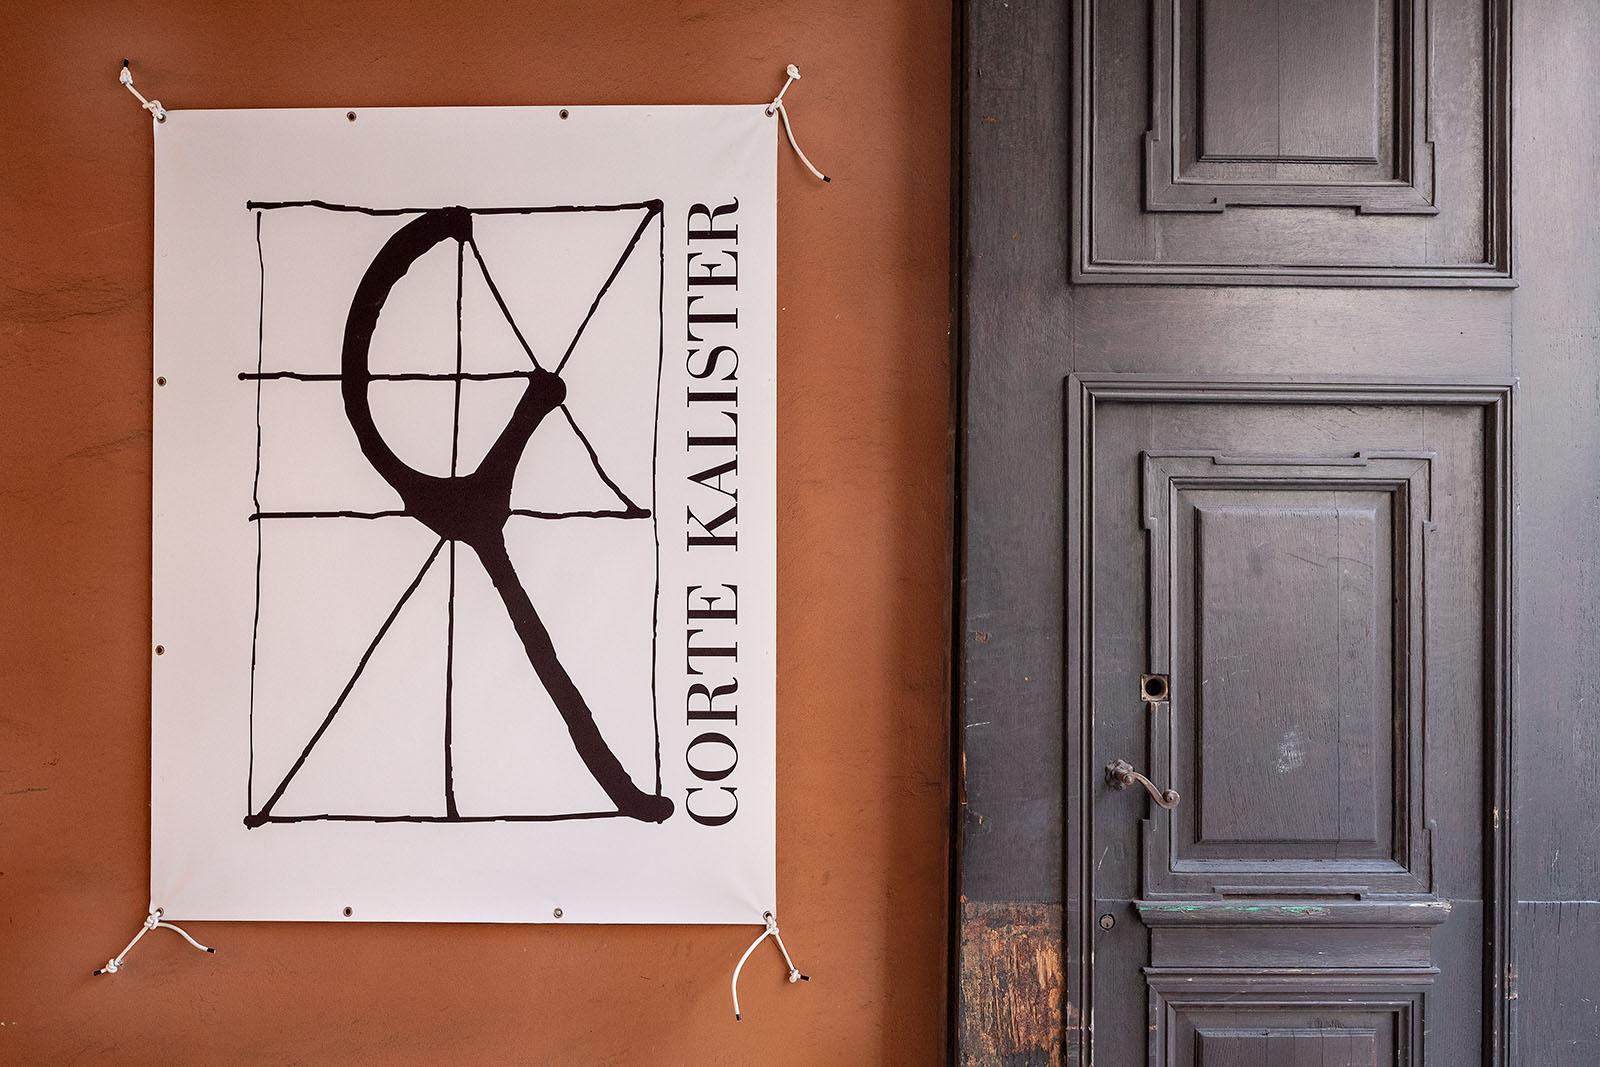 Trieste - Corte Kalister ingresso